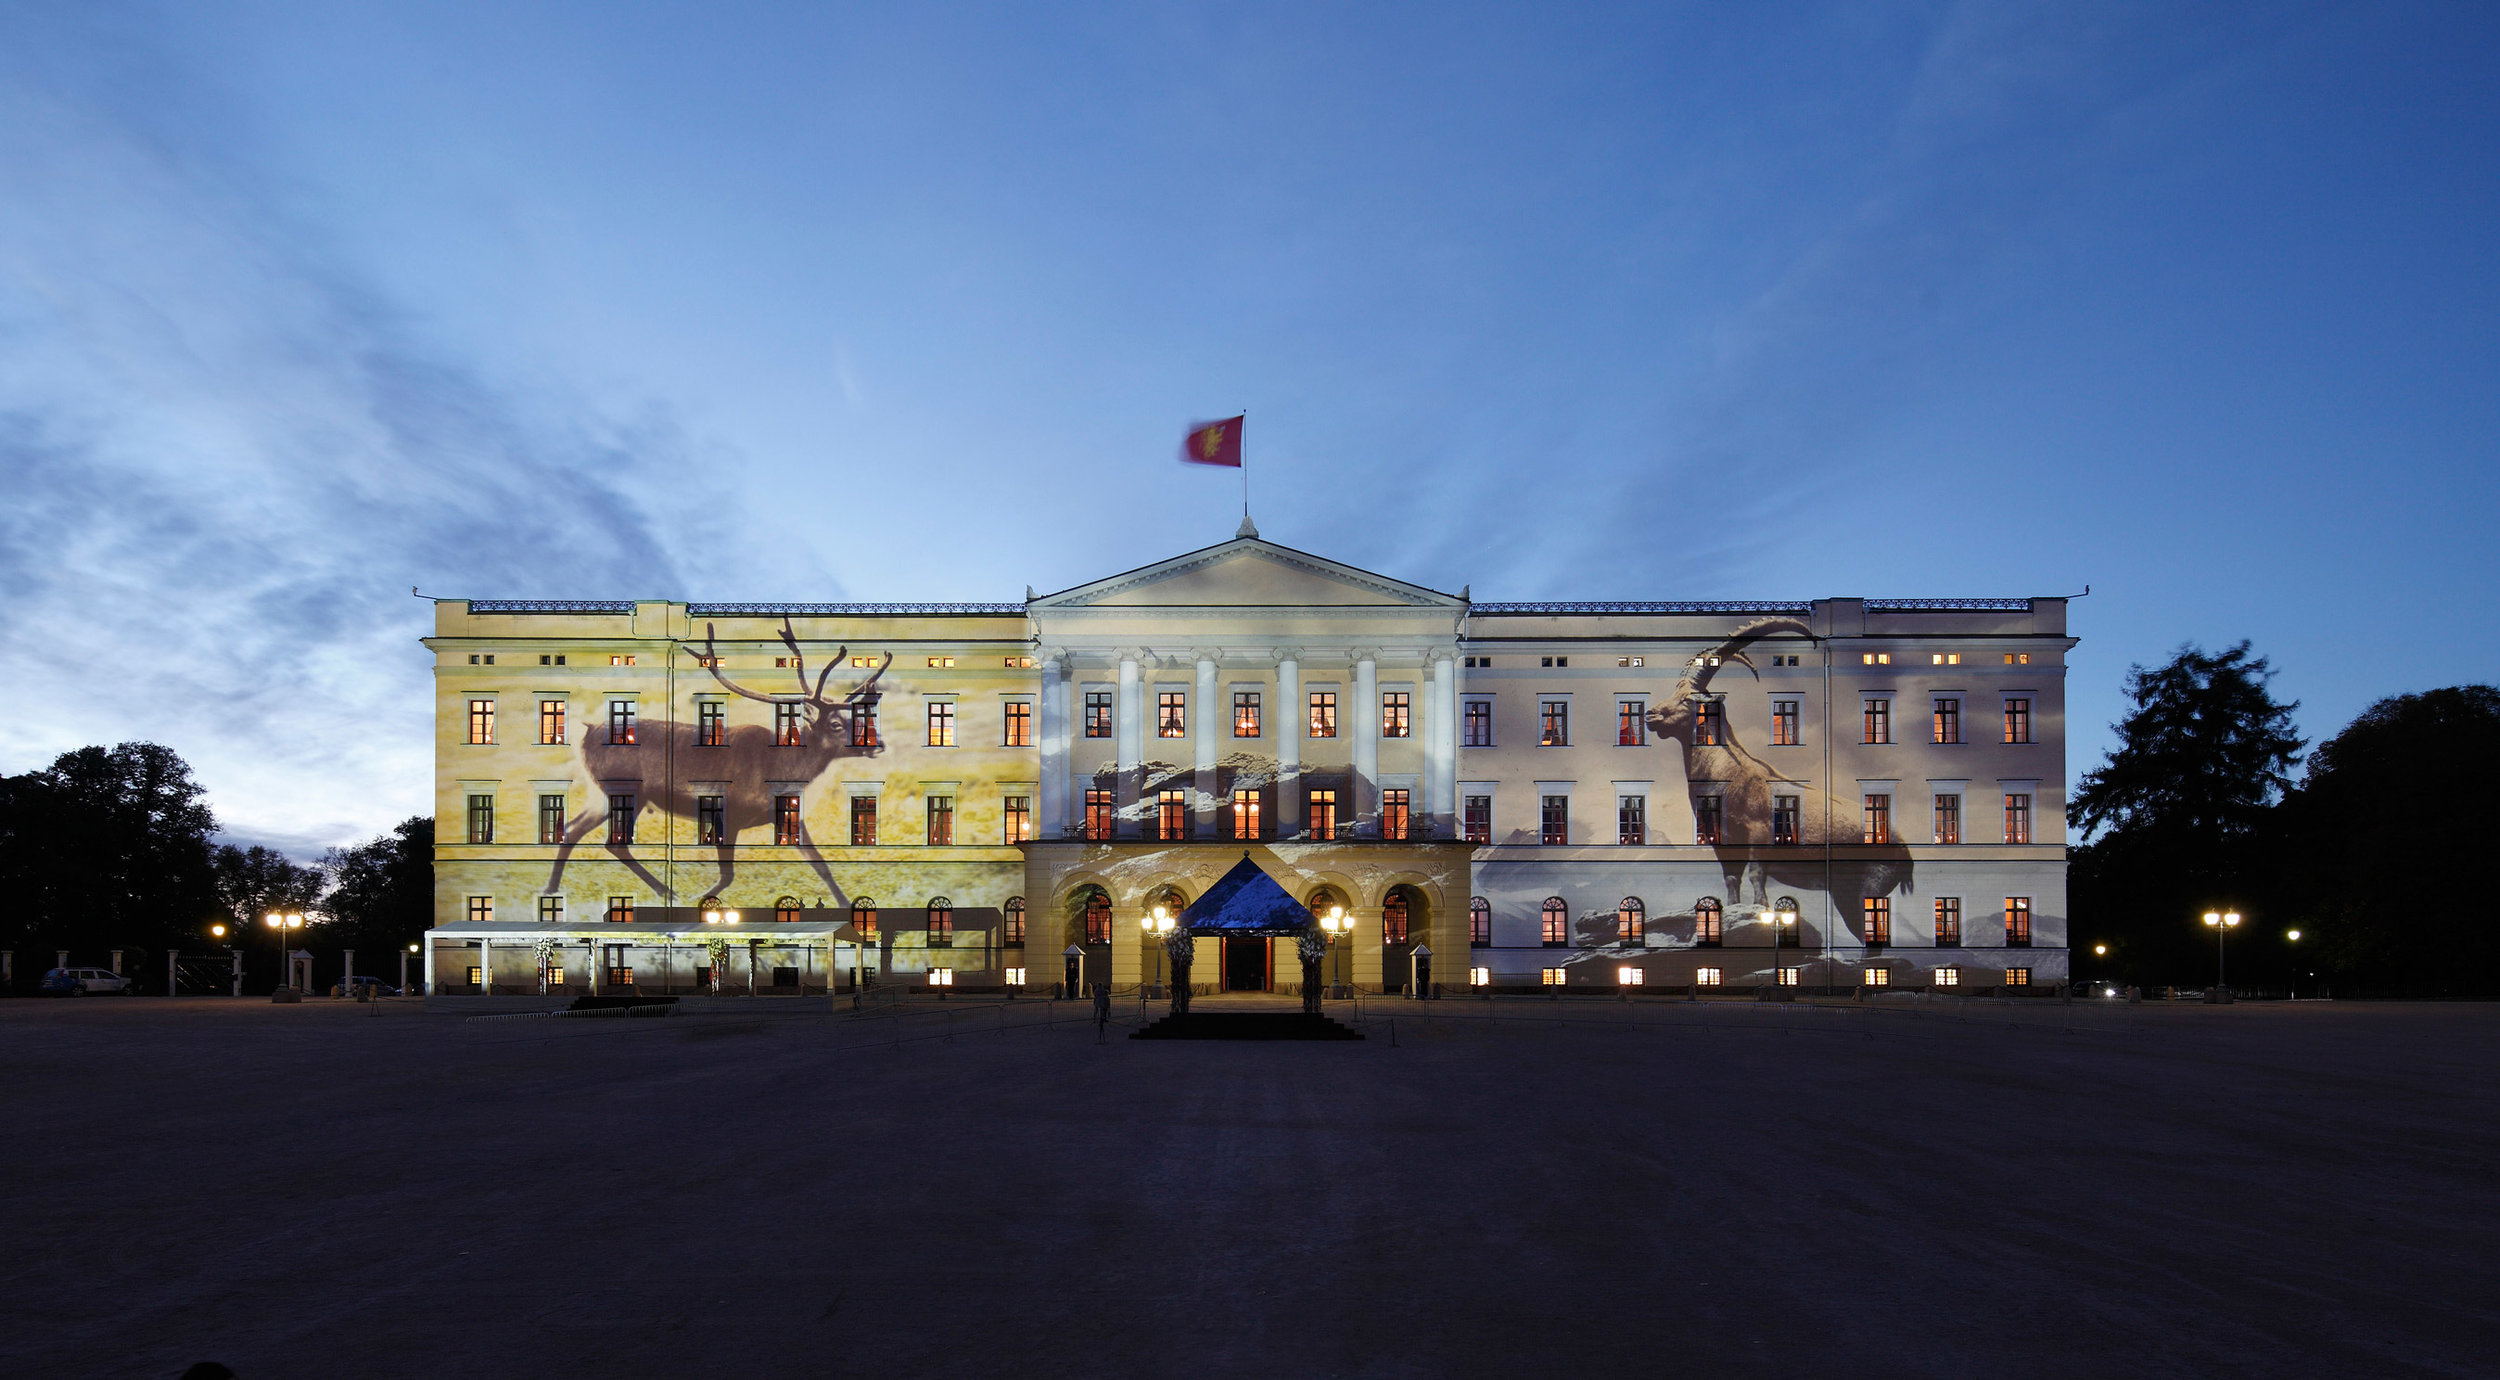 KINGS PALACE, NORWAY